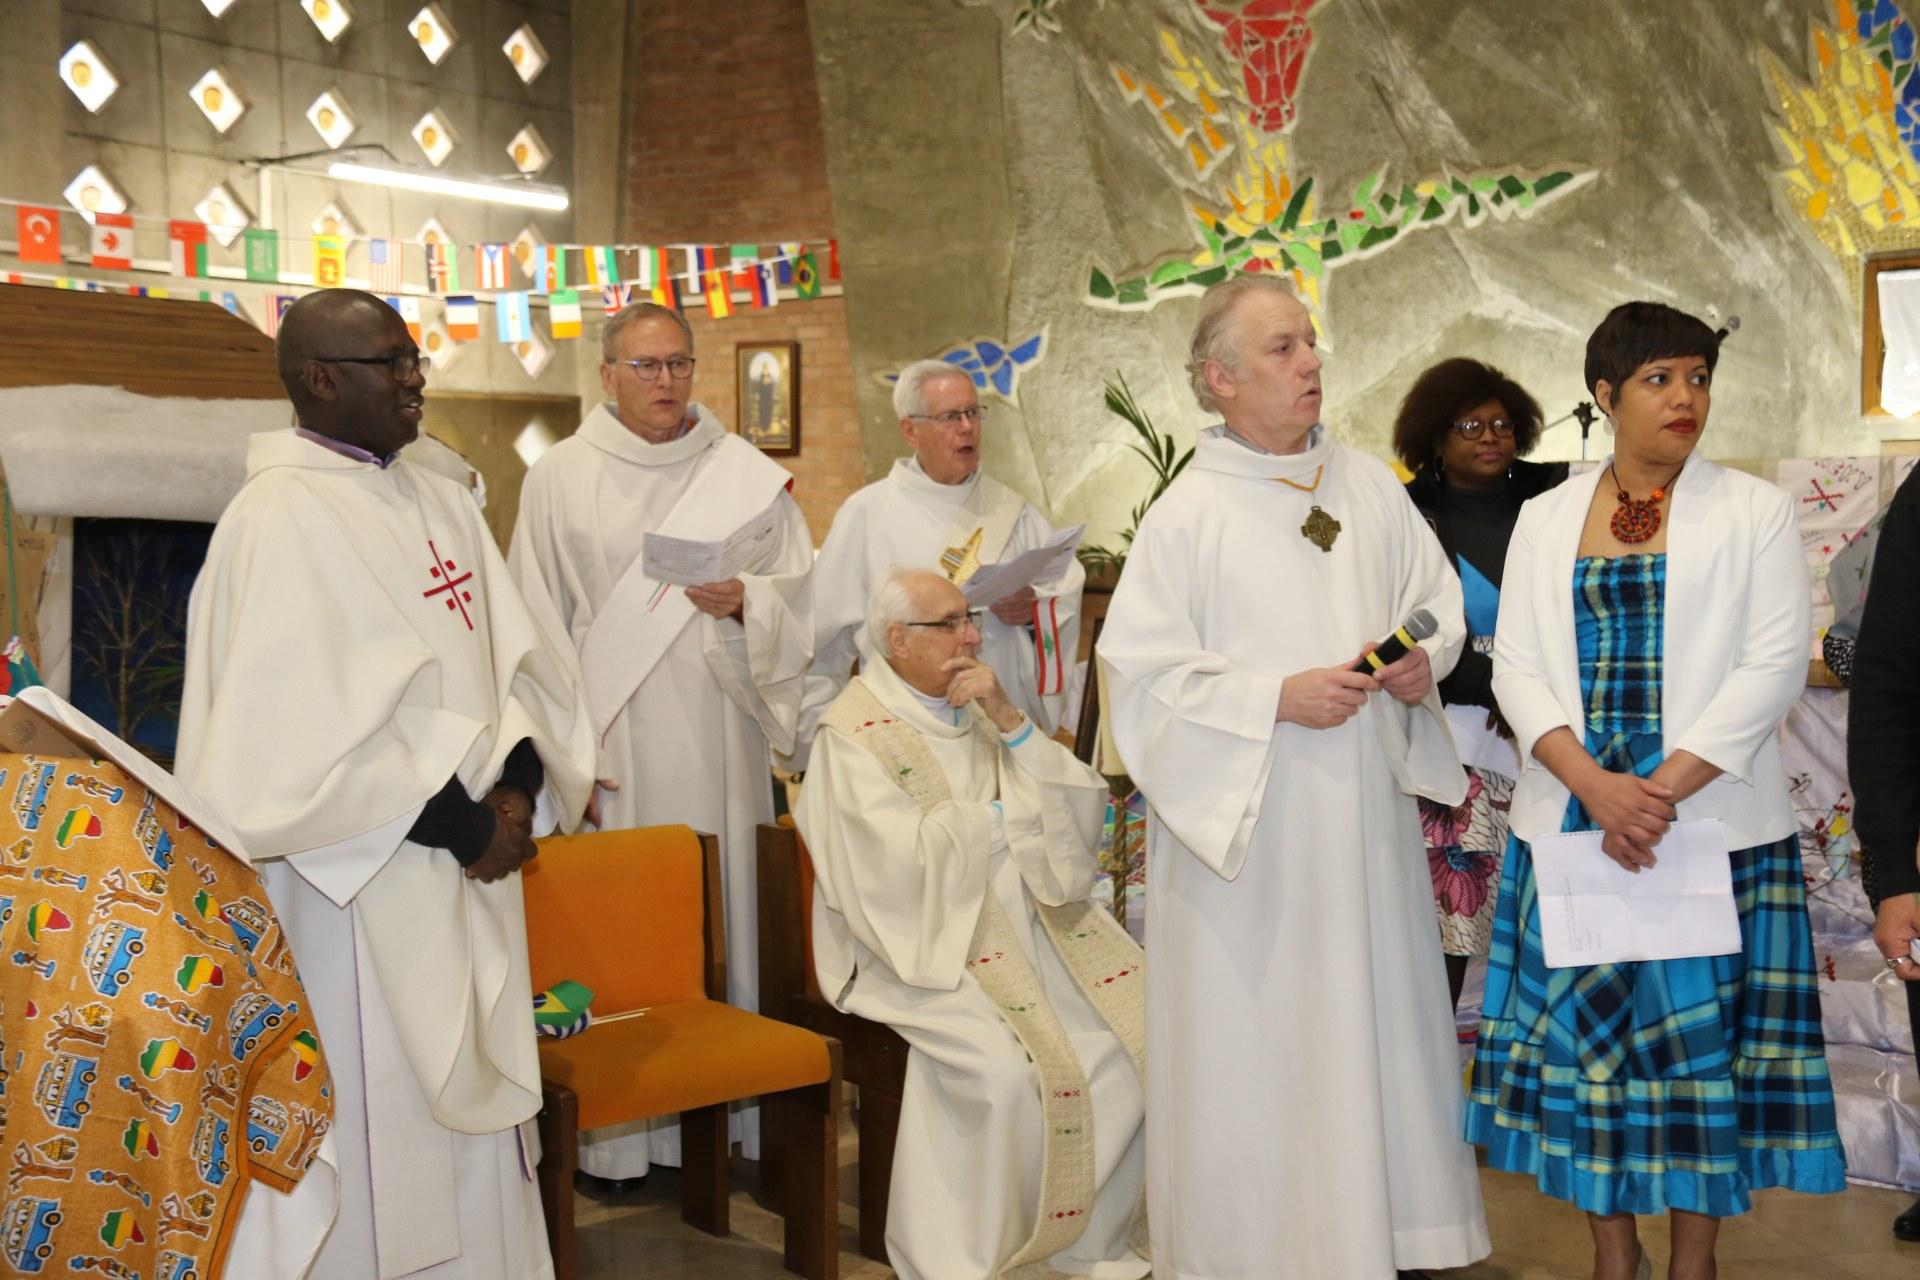 Messe des Nations 51